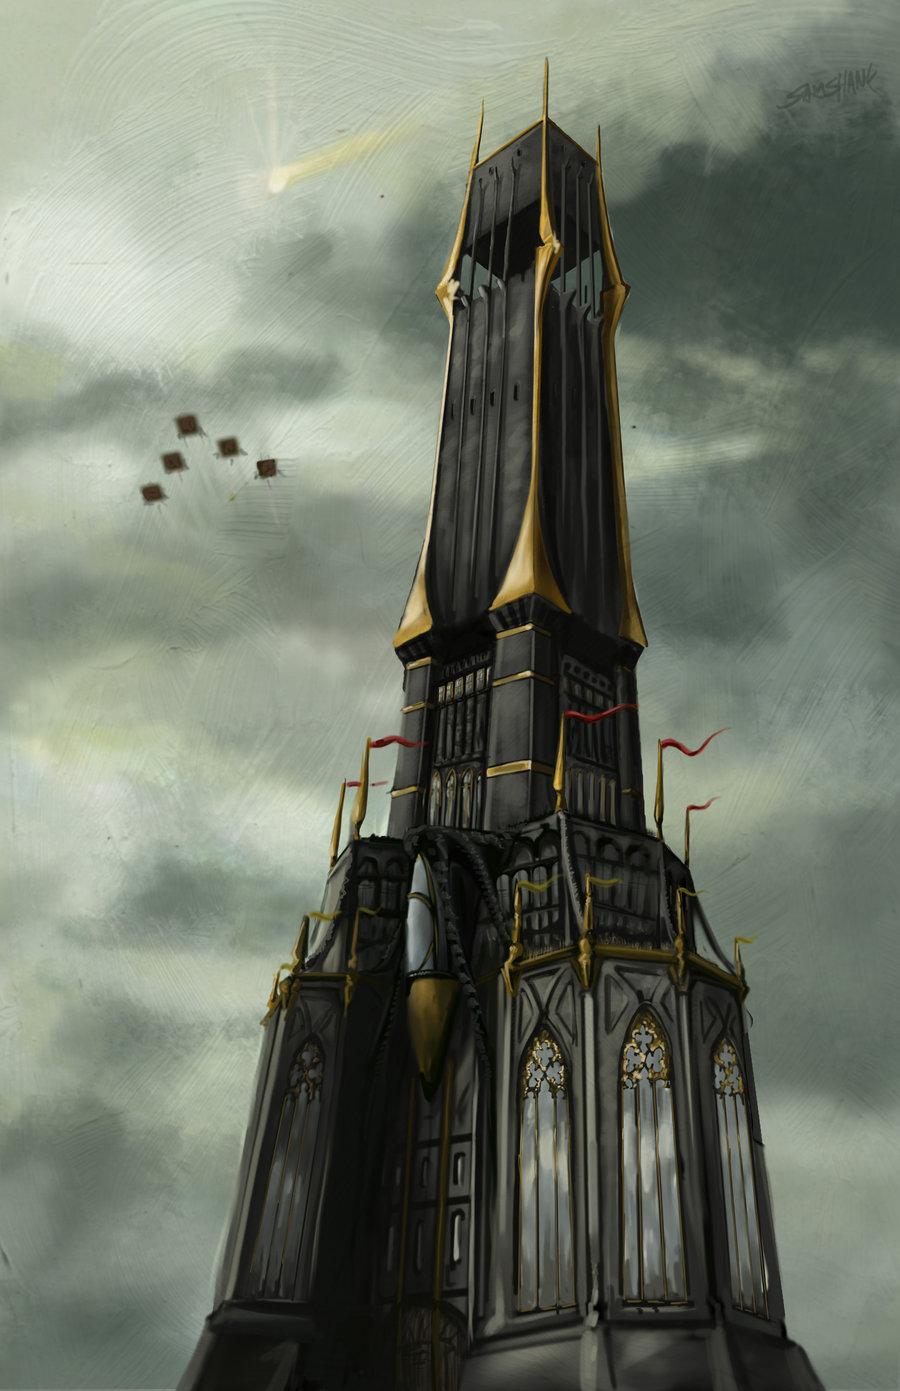 Tower at Charm